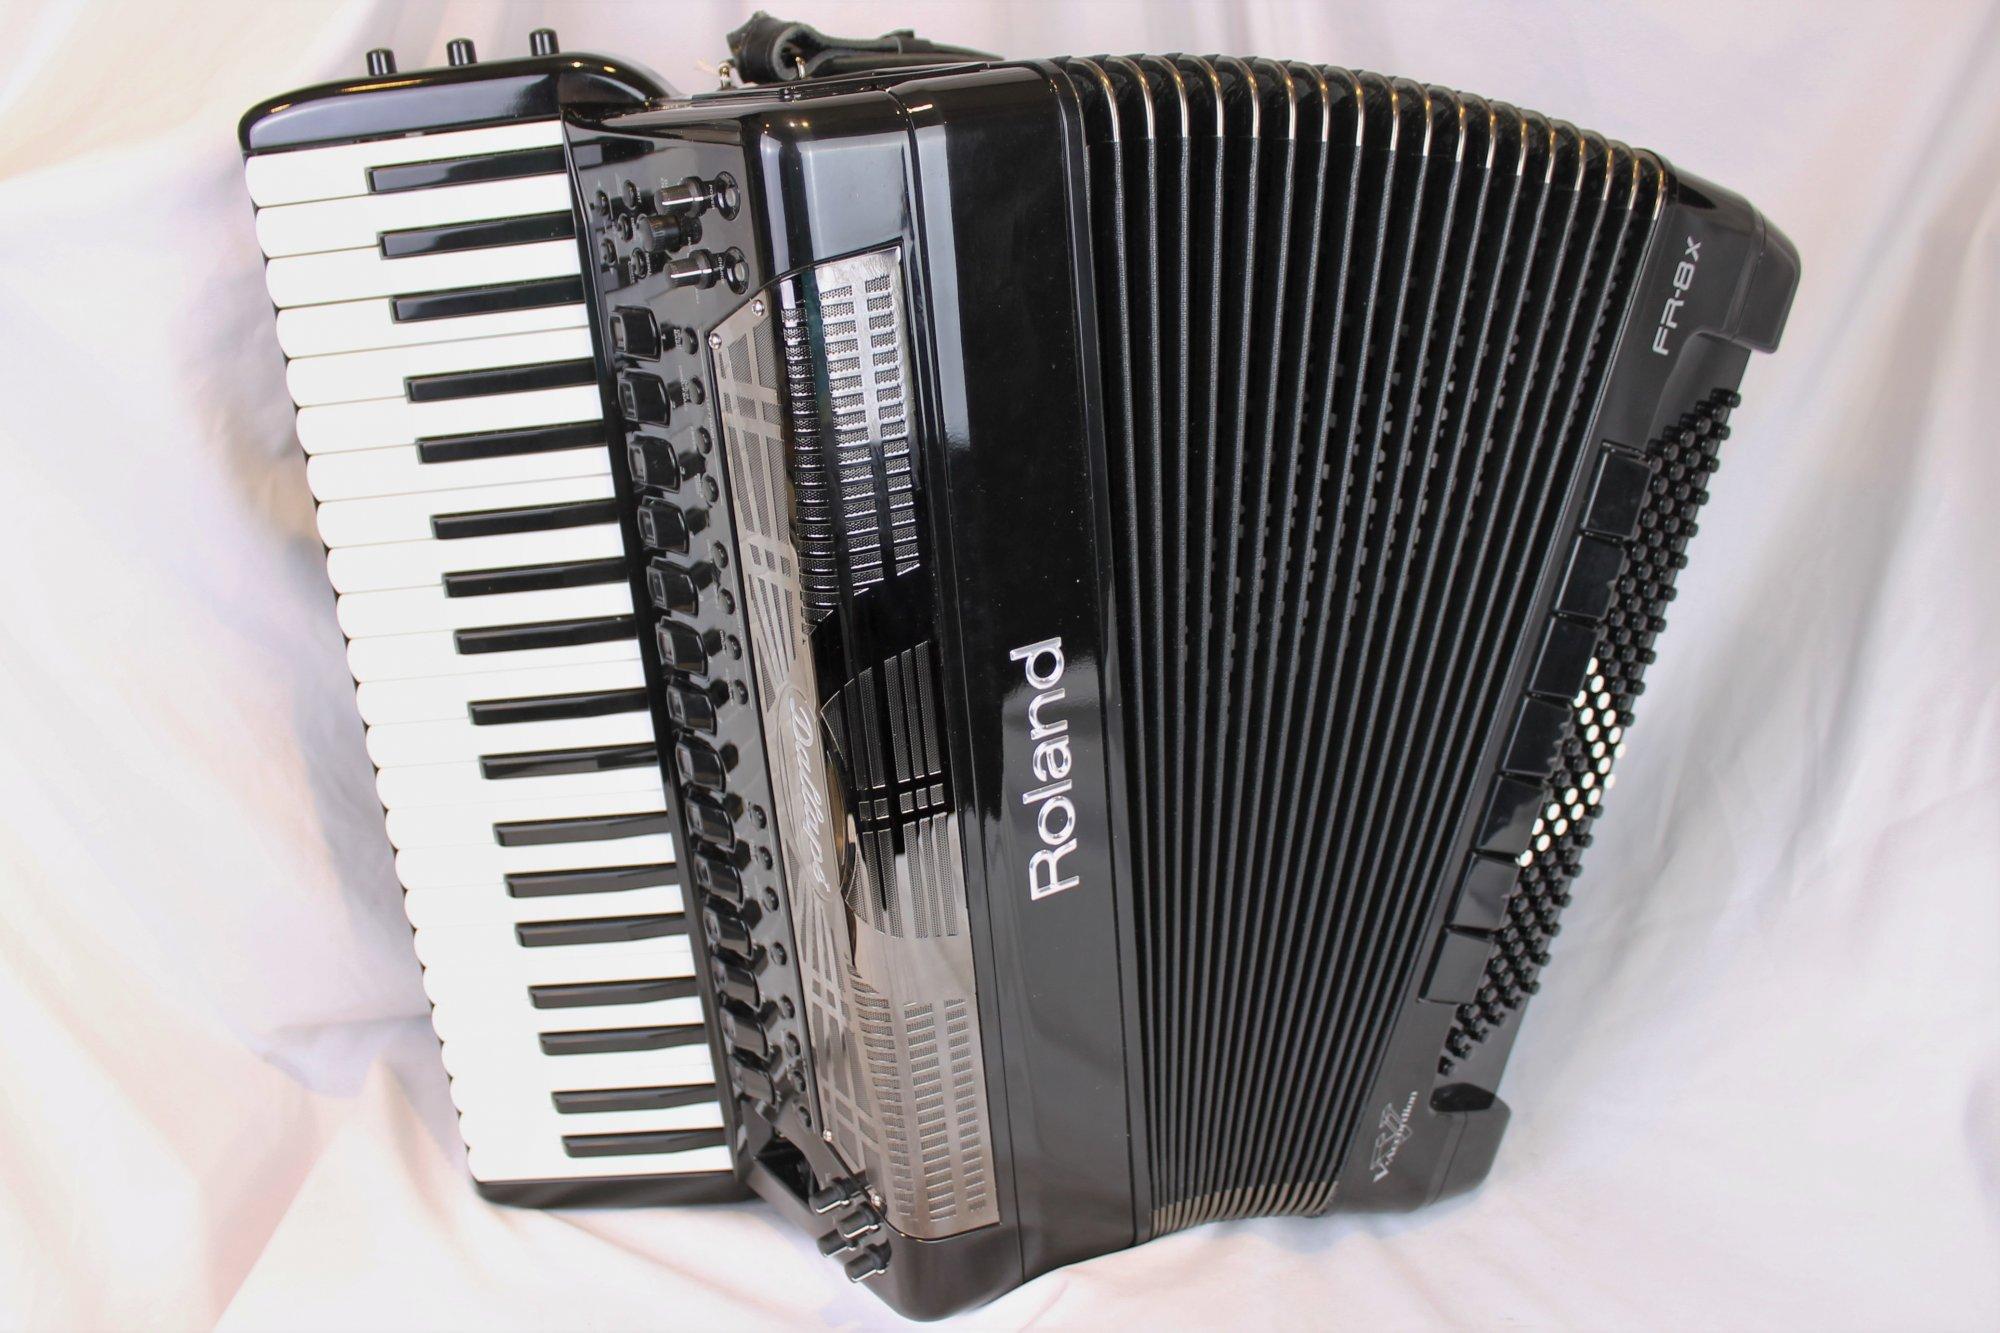 4610 - Black Dallape Limited Edition Roland FR-8X Digital Piano Accordion 41 120